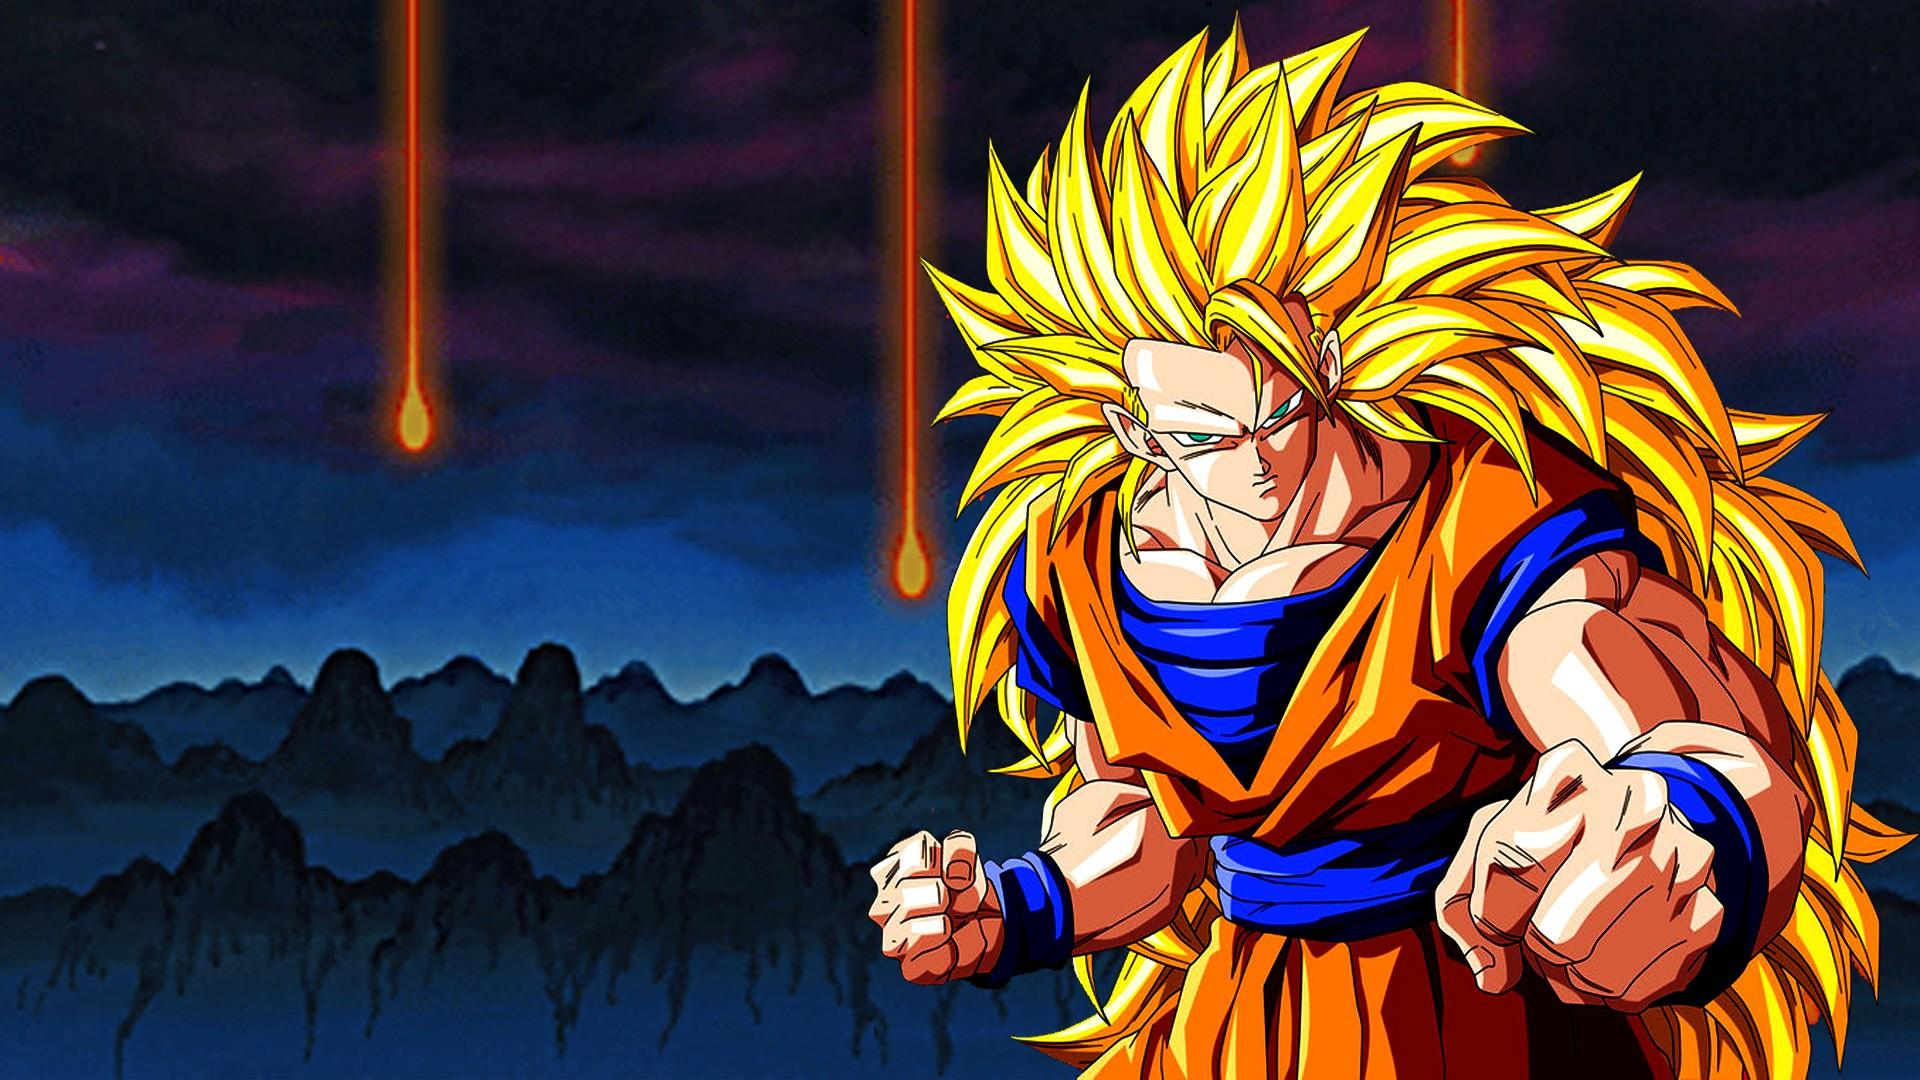 Goku super saiyan wallpaper 77929 1920x1080